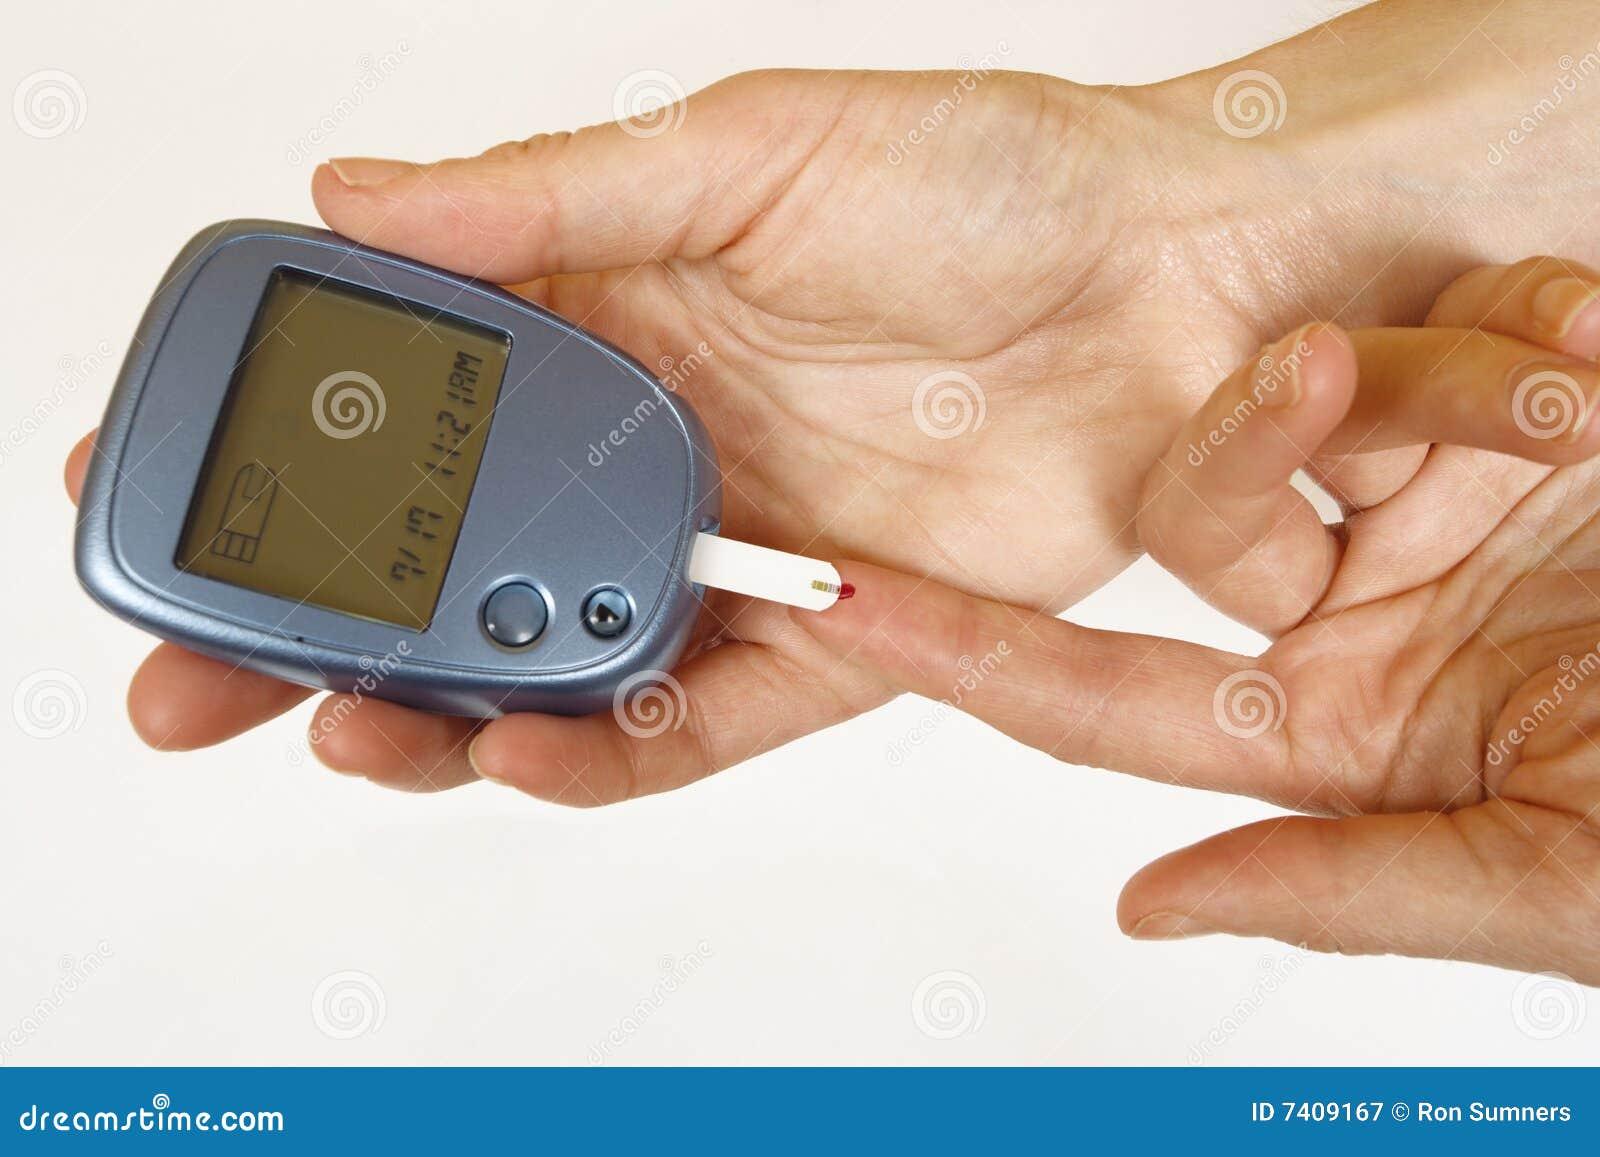 Diabetes self-test